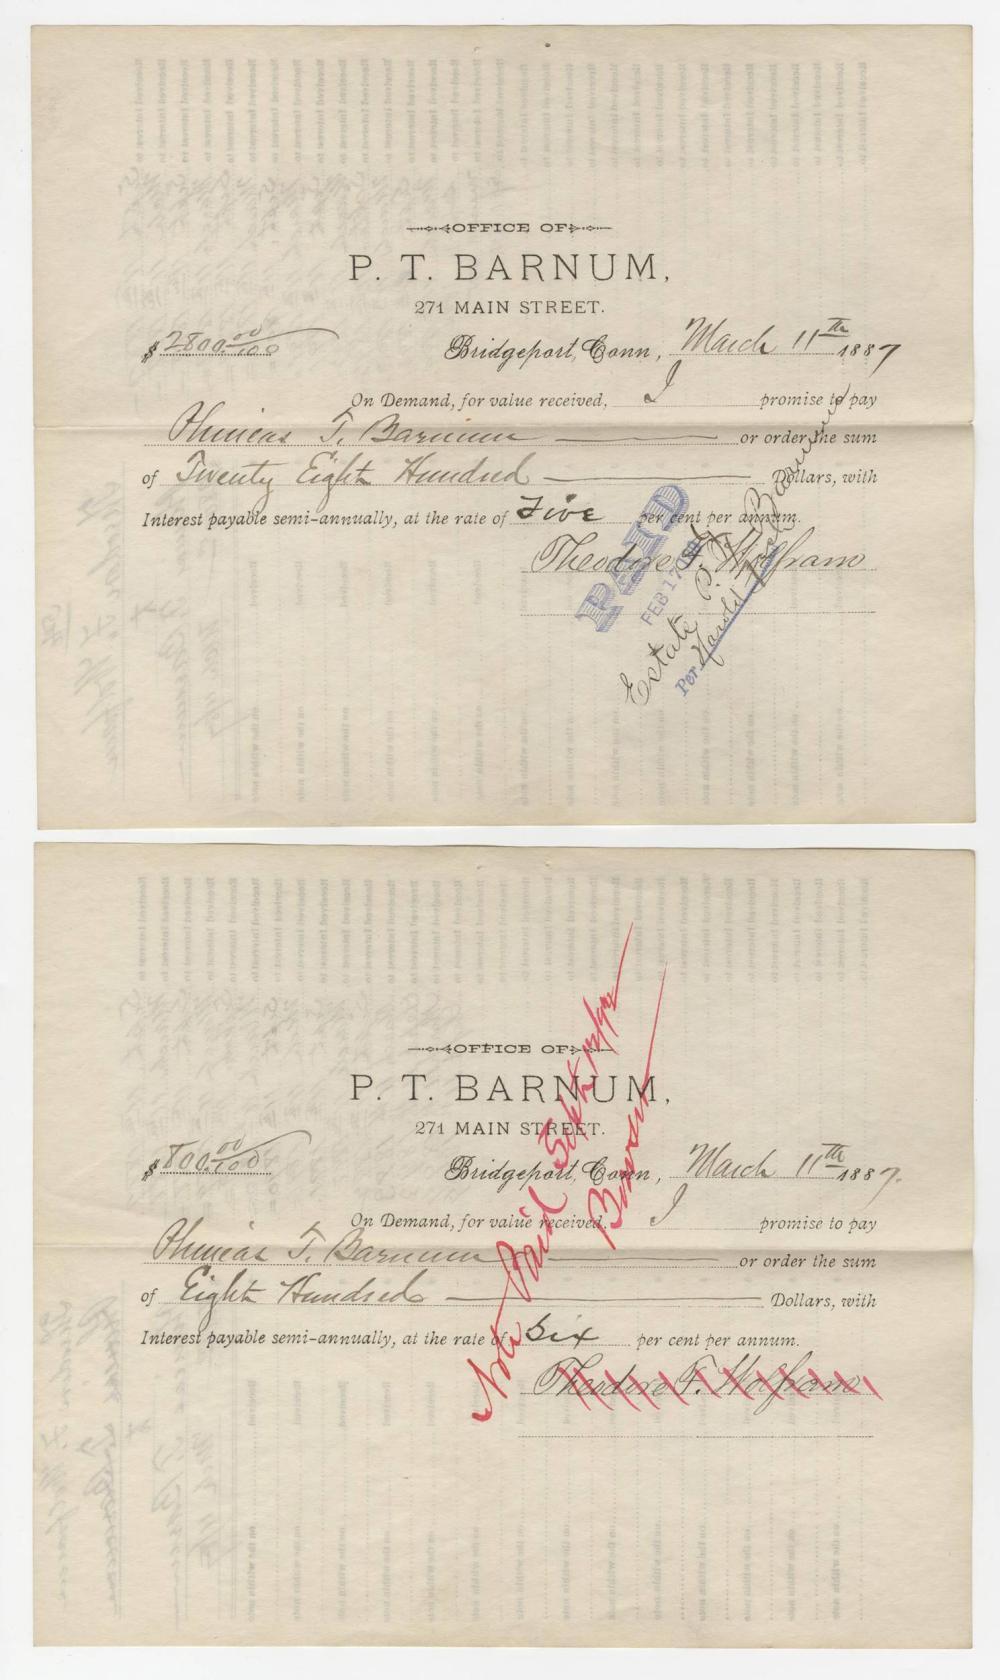 P.T. Barnum Signed Land Conveyance